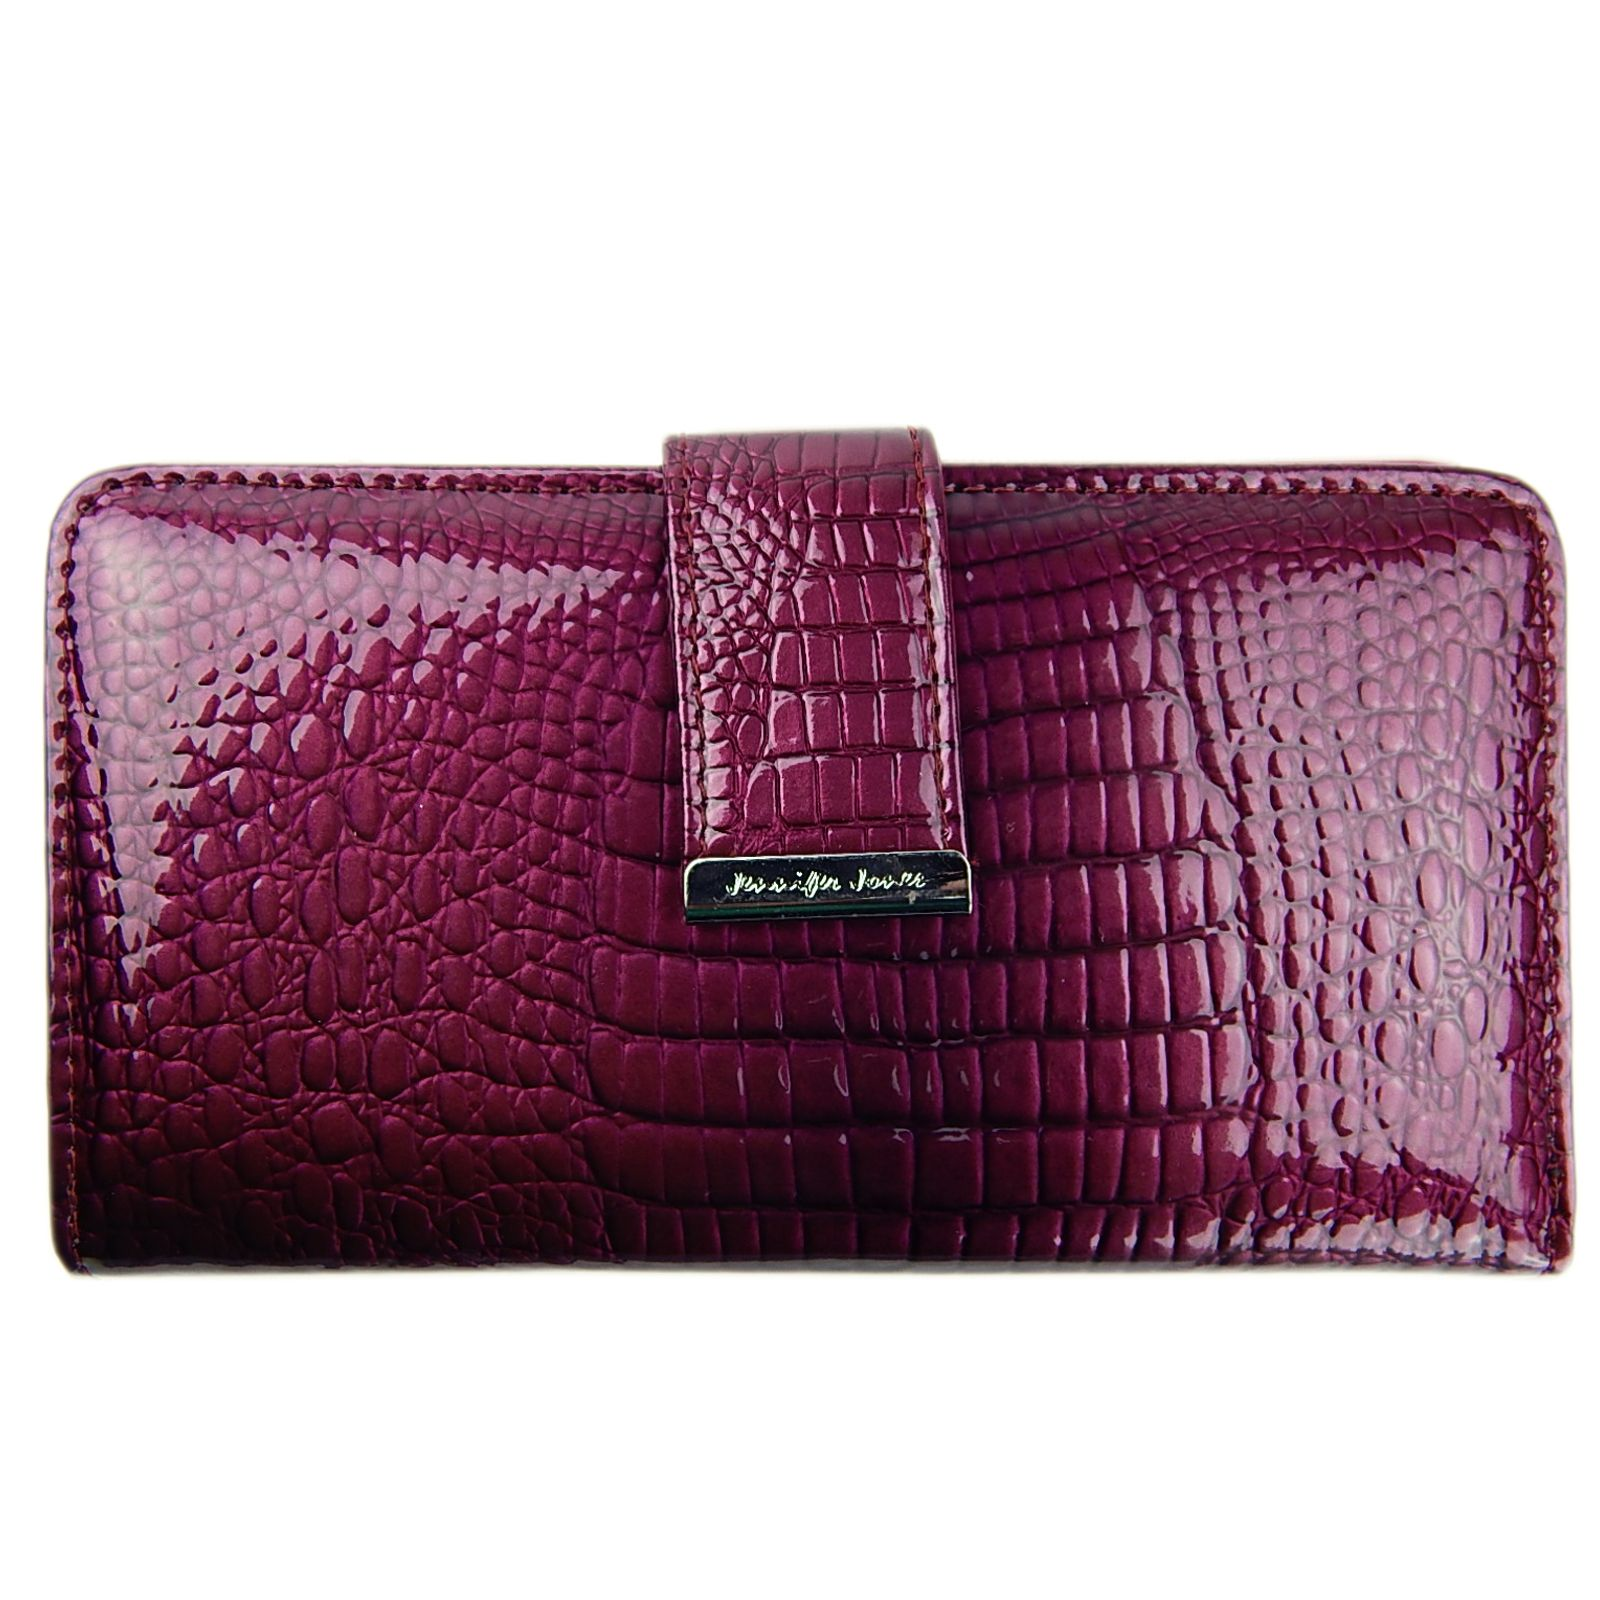 Kožená dámská peněženka Bordo